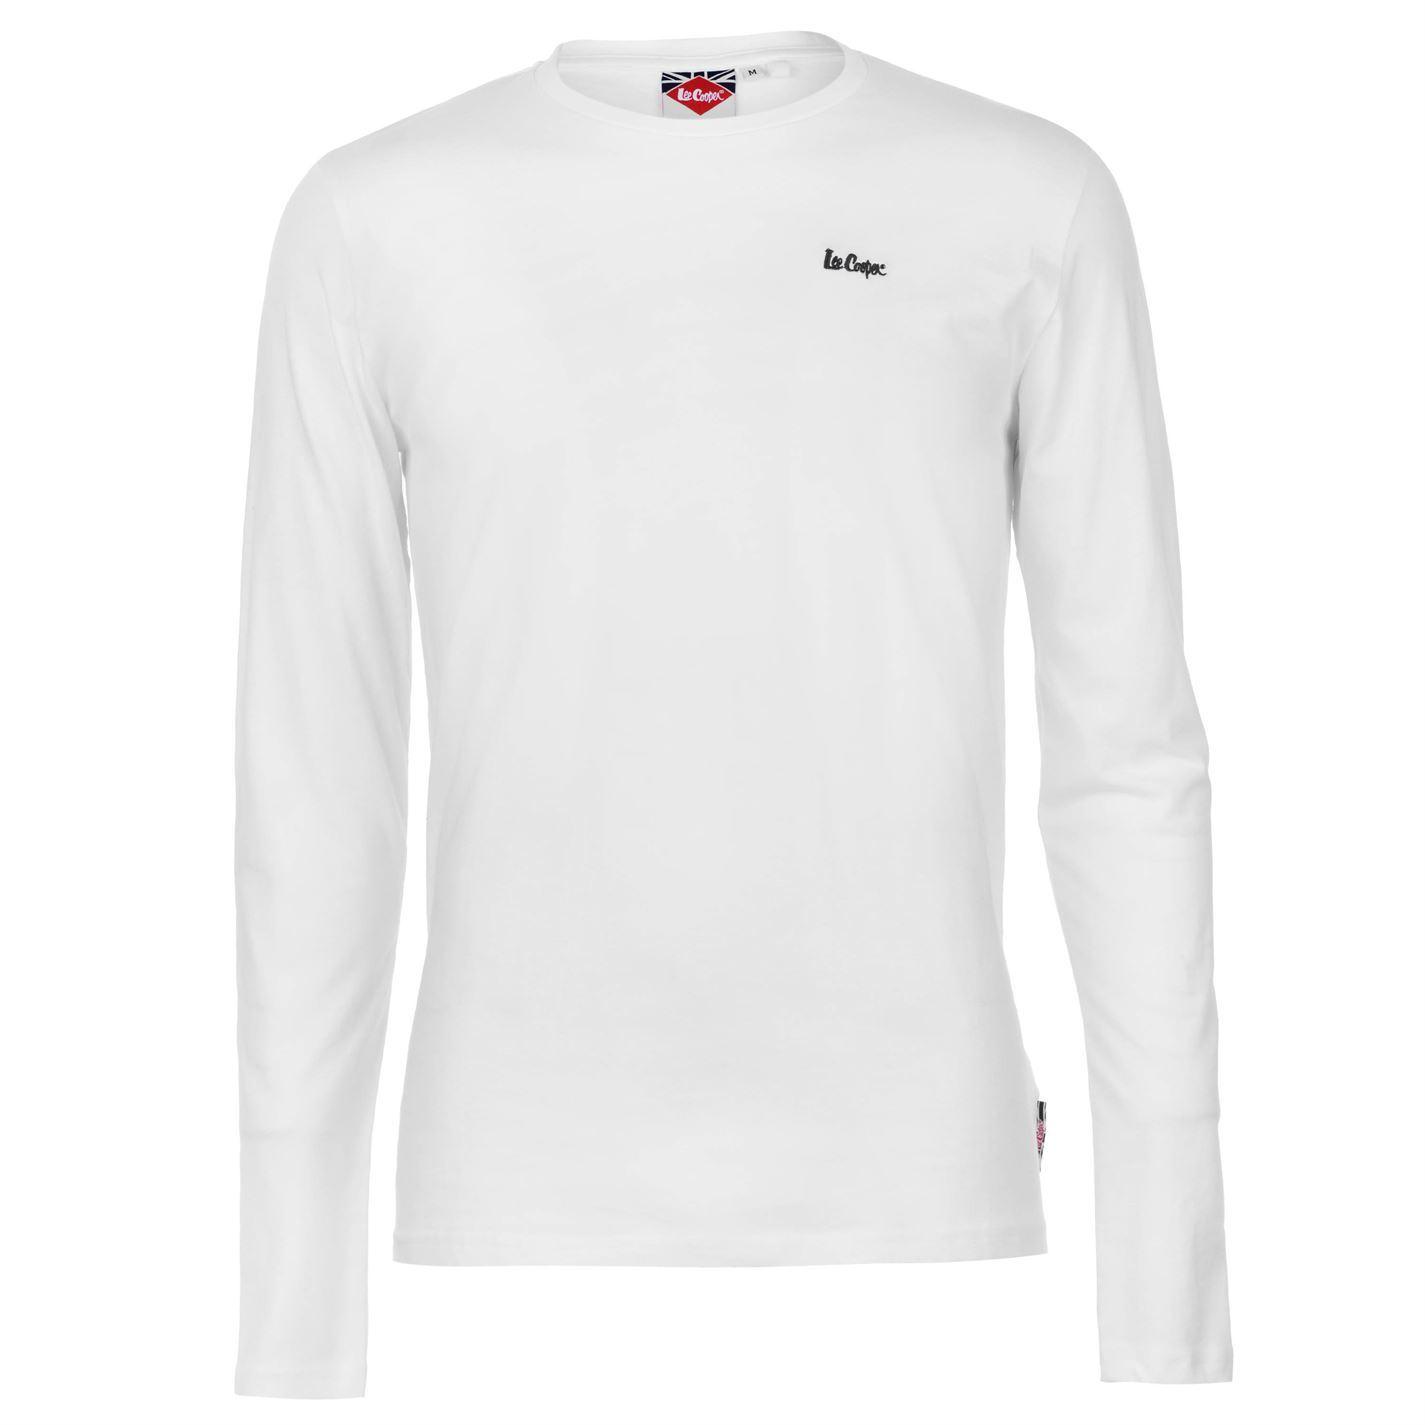 7c628568bb91 Details about Lee Cooper Mens Essentials Long Sleeve Crew T Shirt Top Neck  Lightweight Cotton